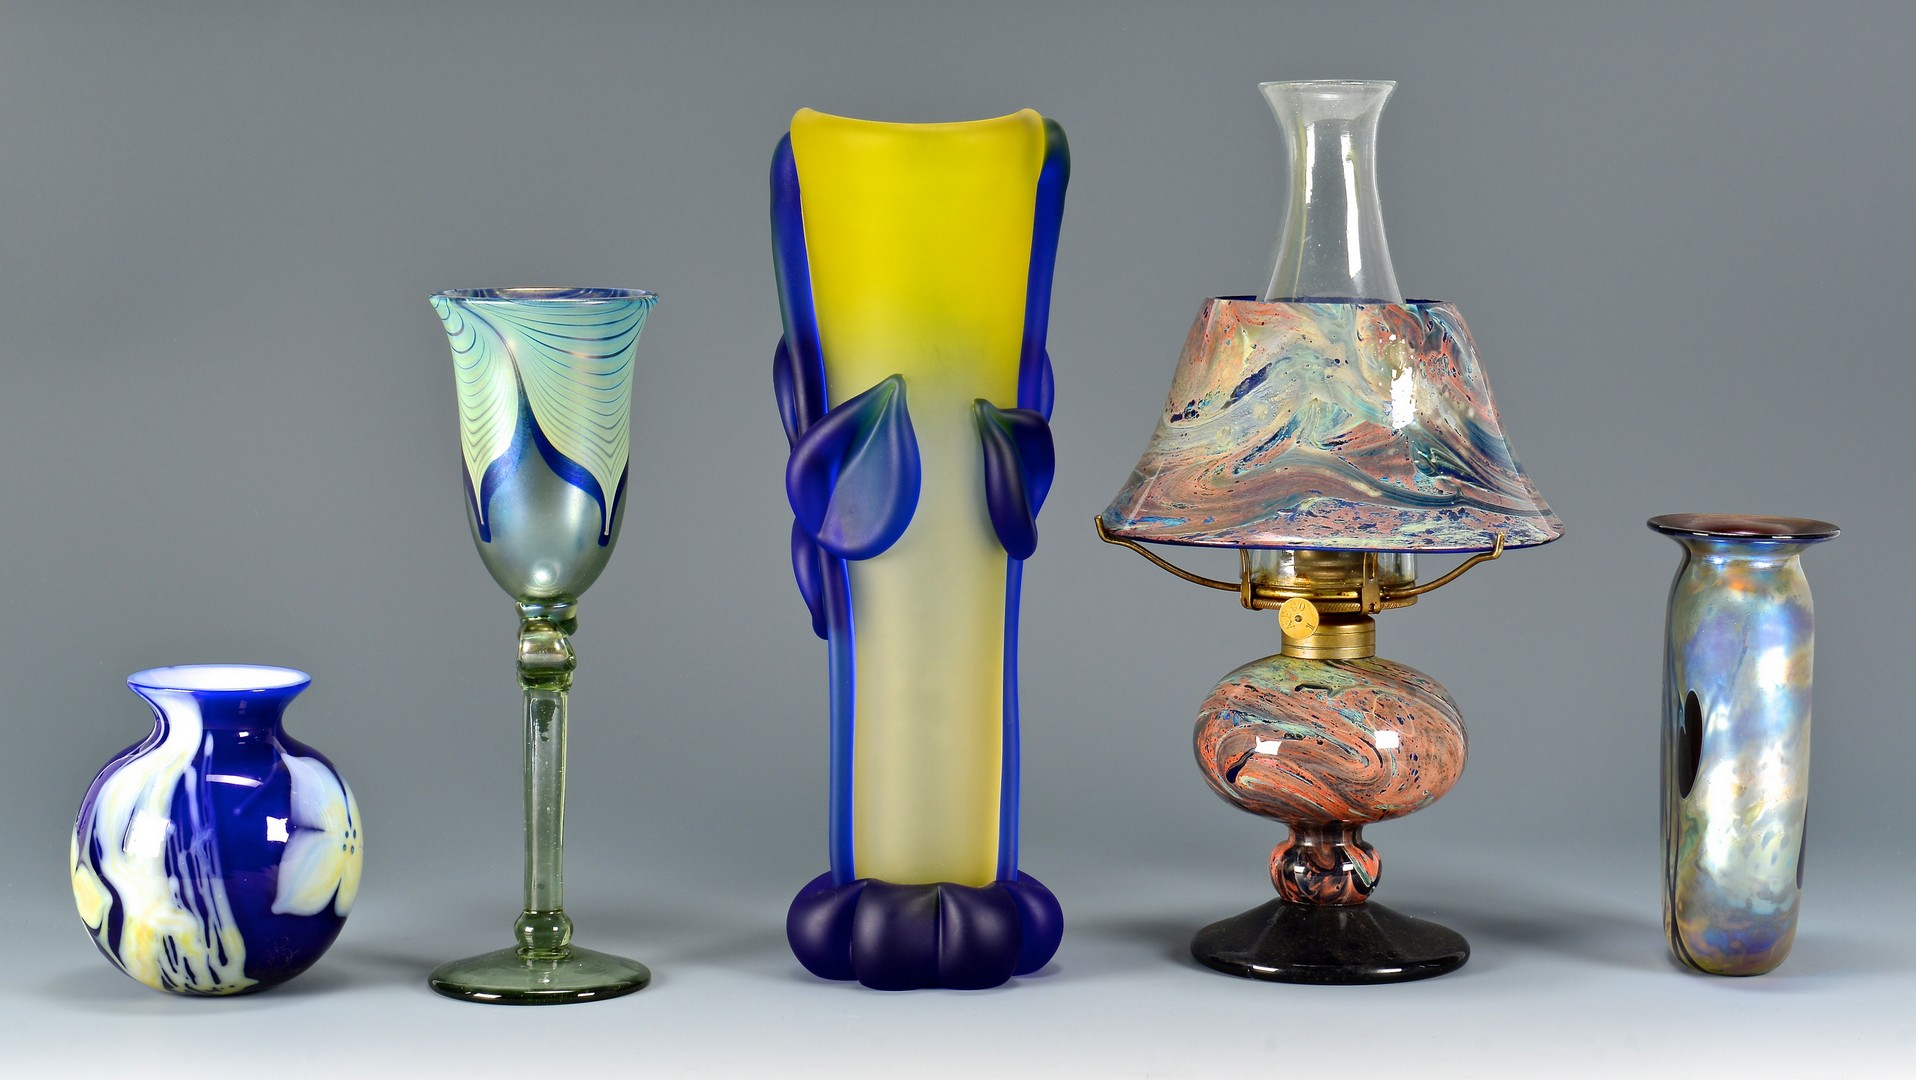 Lot 454: Group of Contemp. Signed Art Glass Items, 5 pcs.